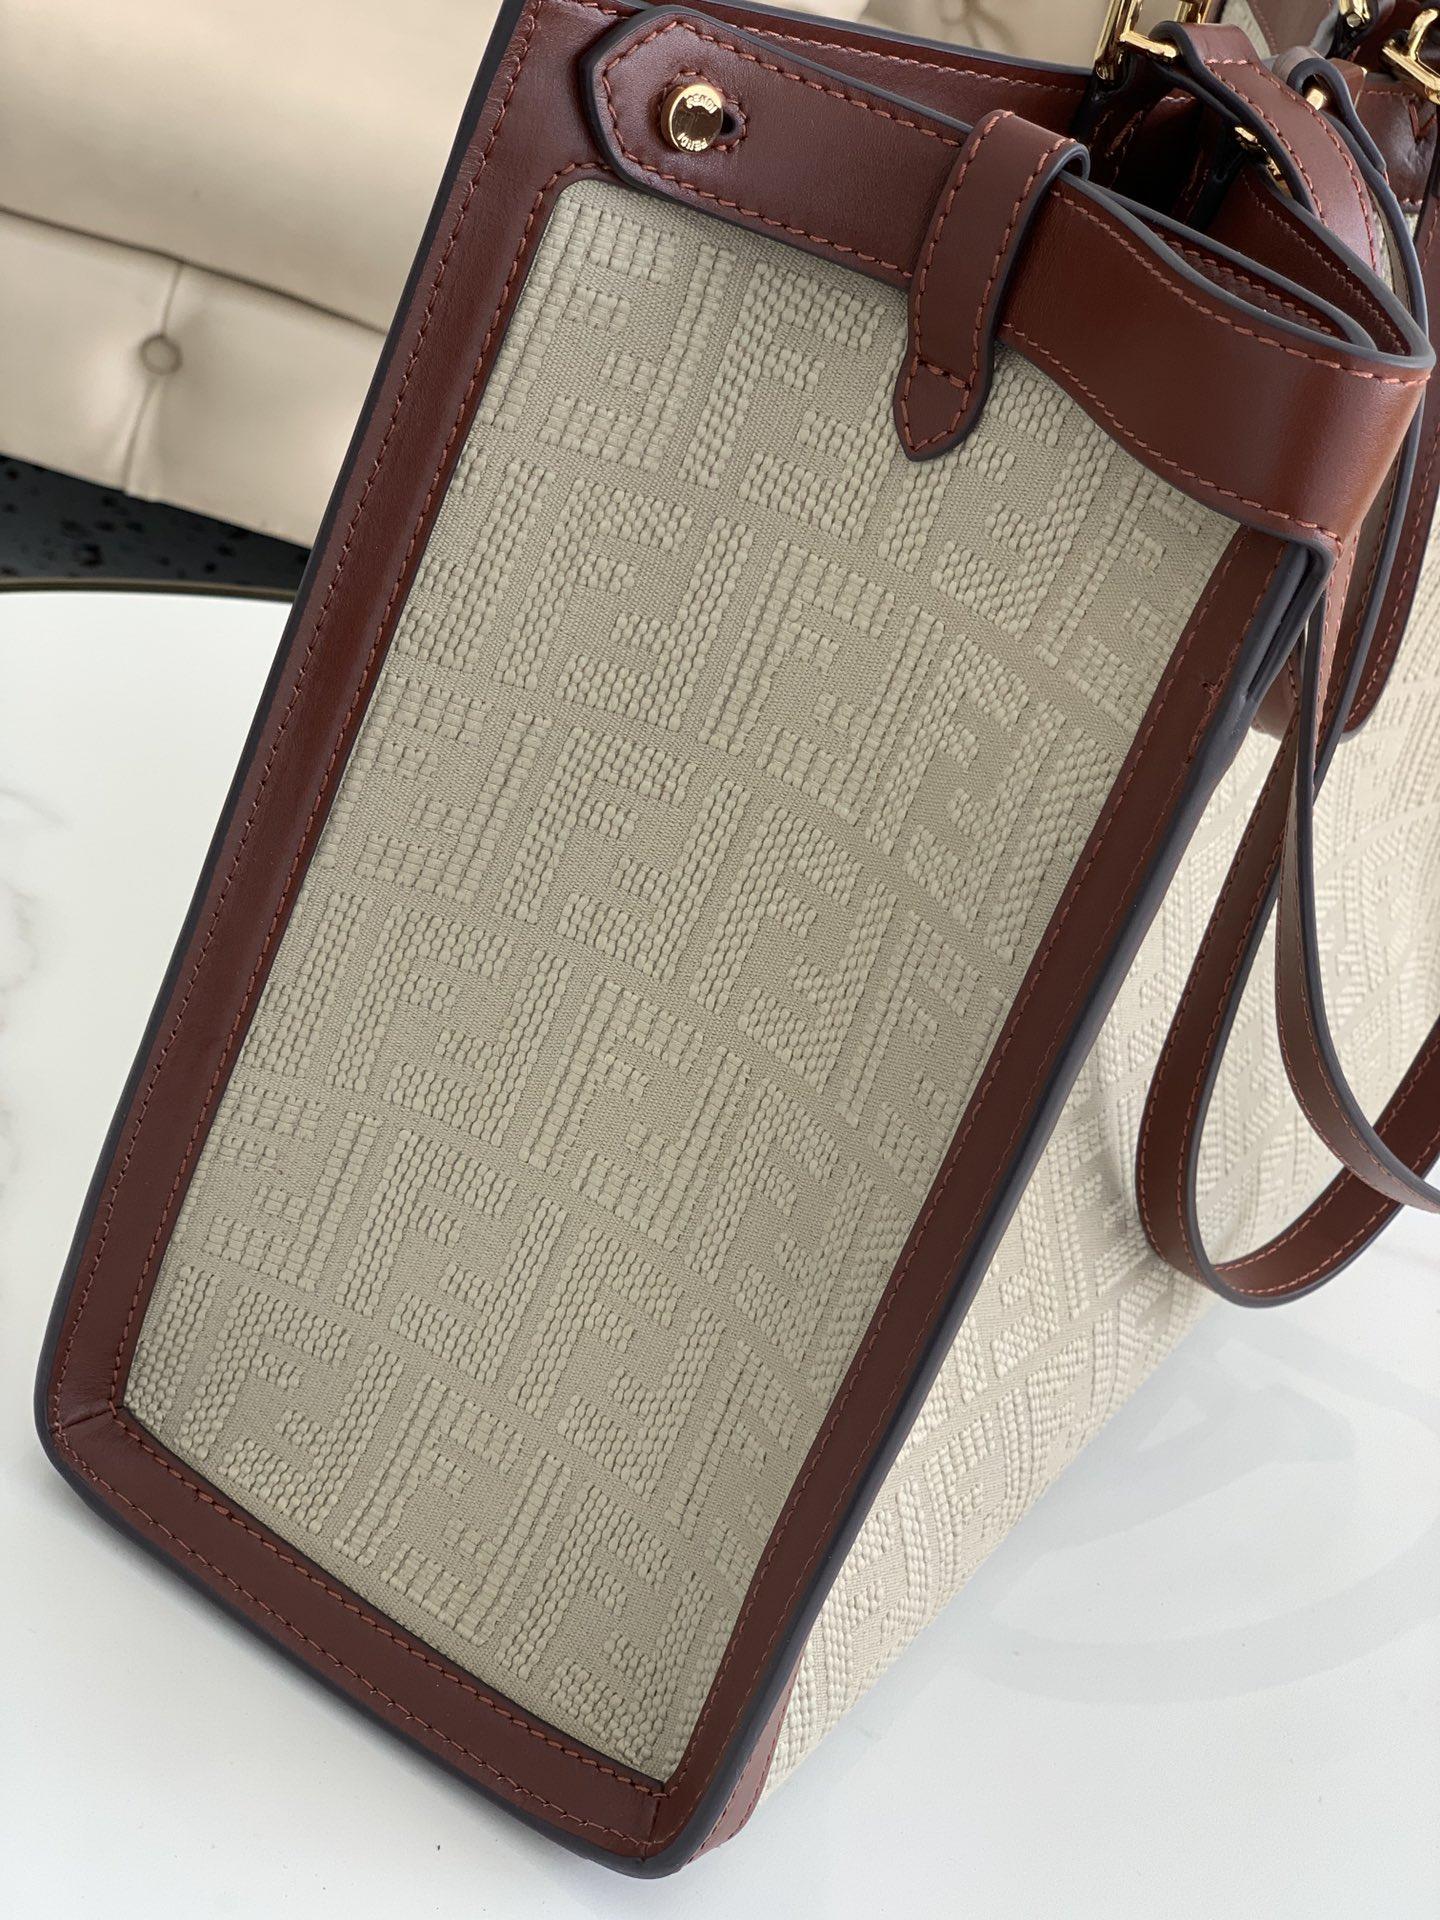 fendi芬迪最新peekaboo x.tote 帆布上面配上双F的刺绣 复古又高级 41x30x16cm